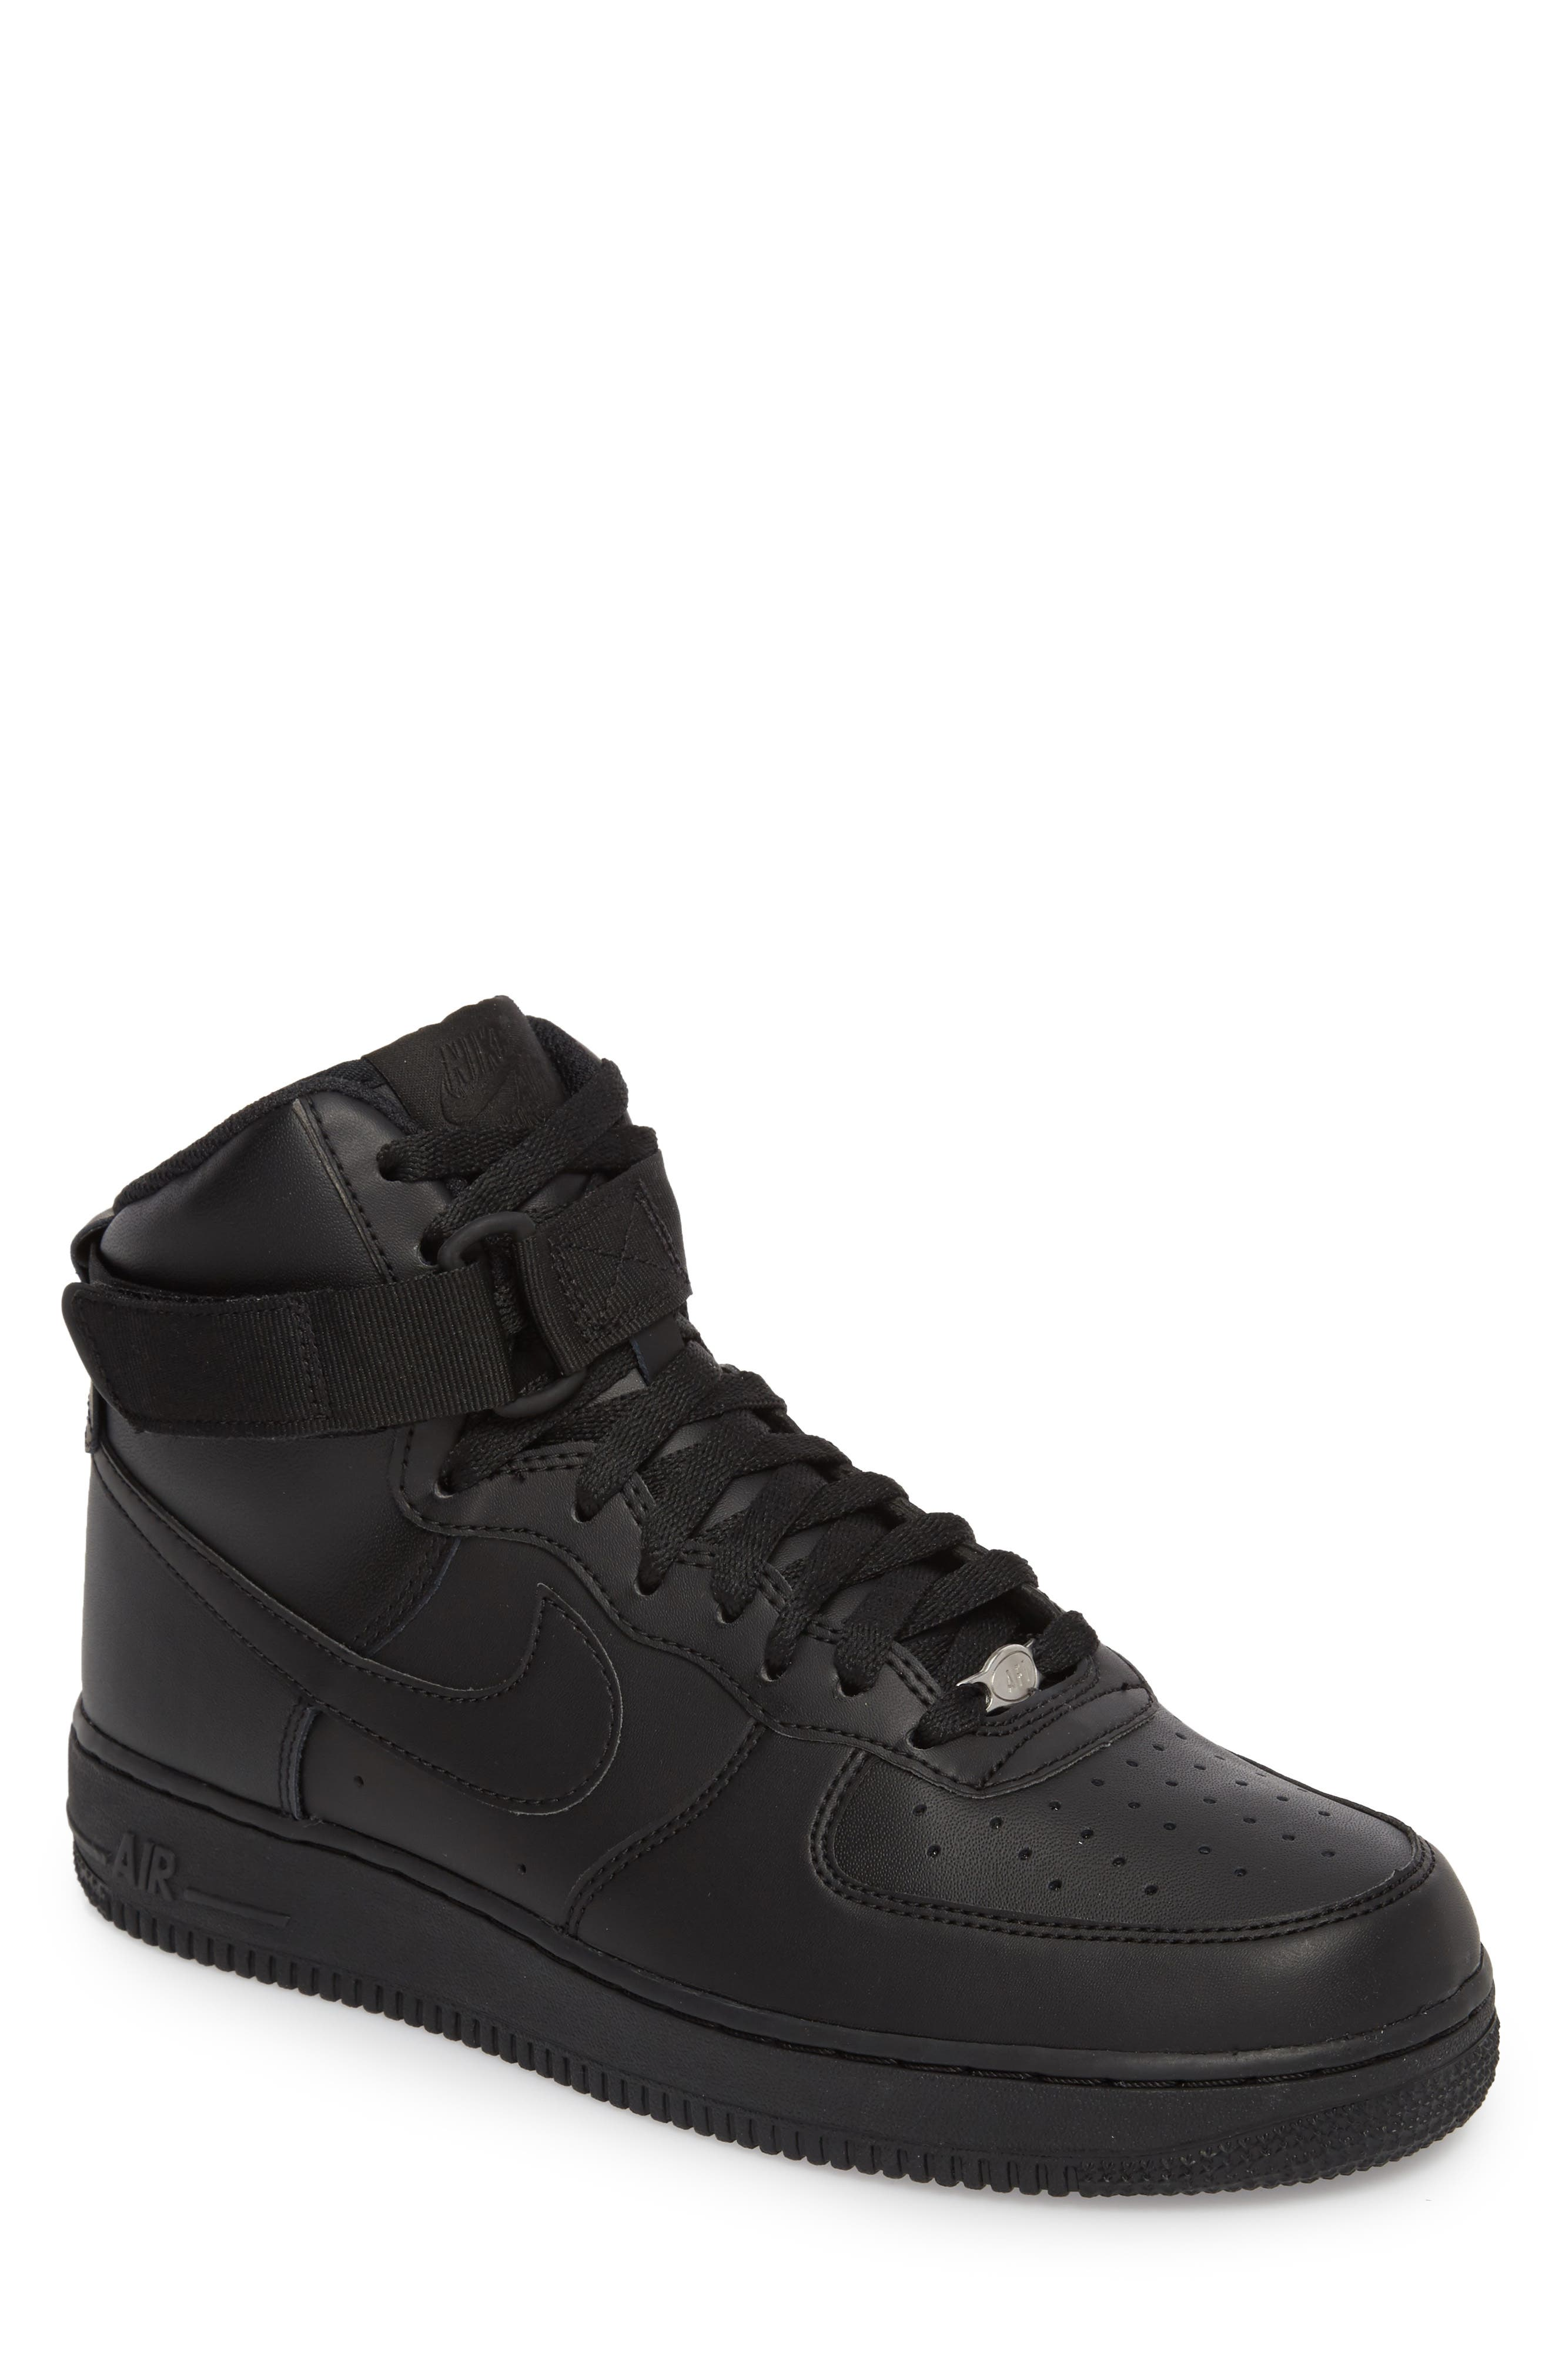 Air Force 1 High '07 Sneaker,                         Main,                         color, Black/ Black